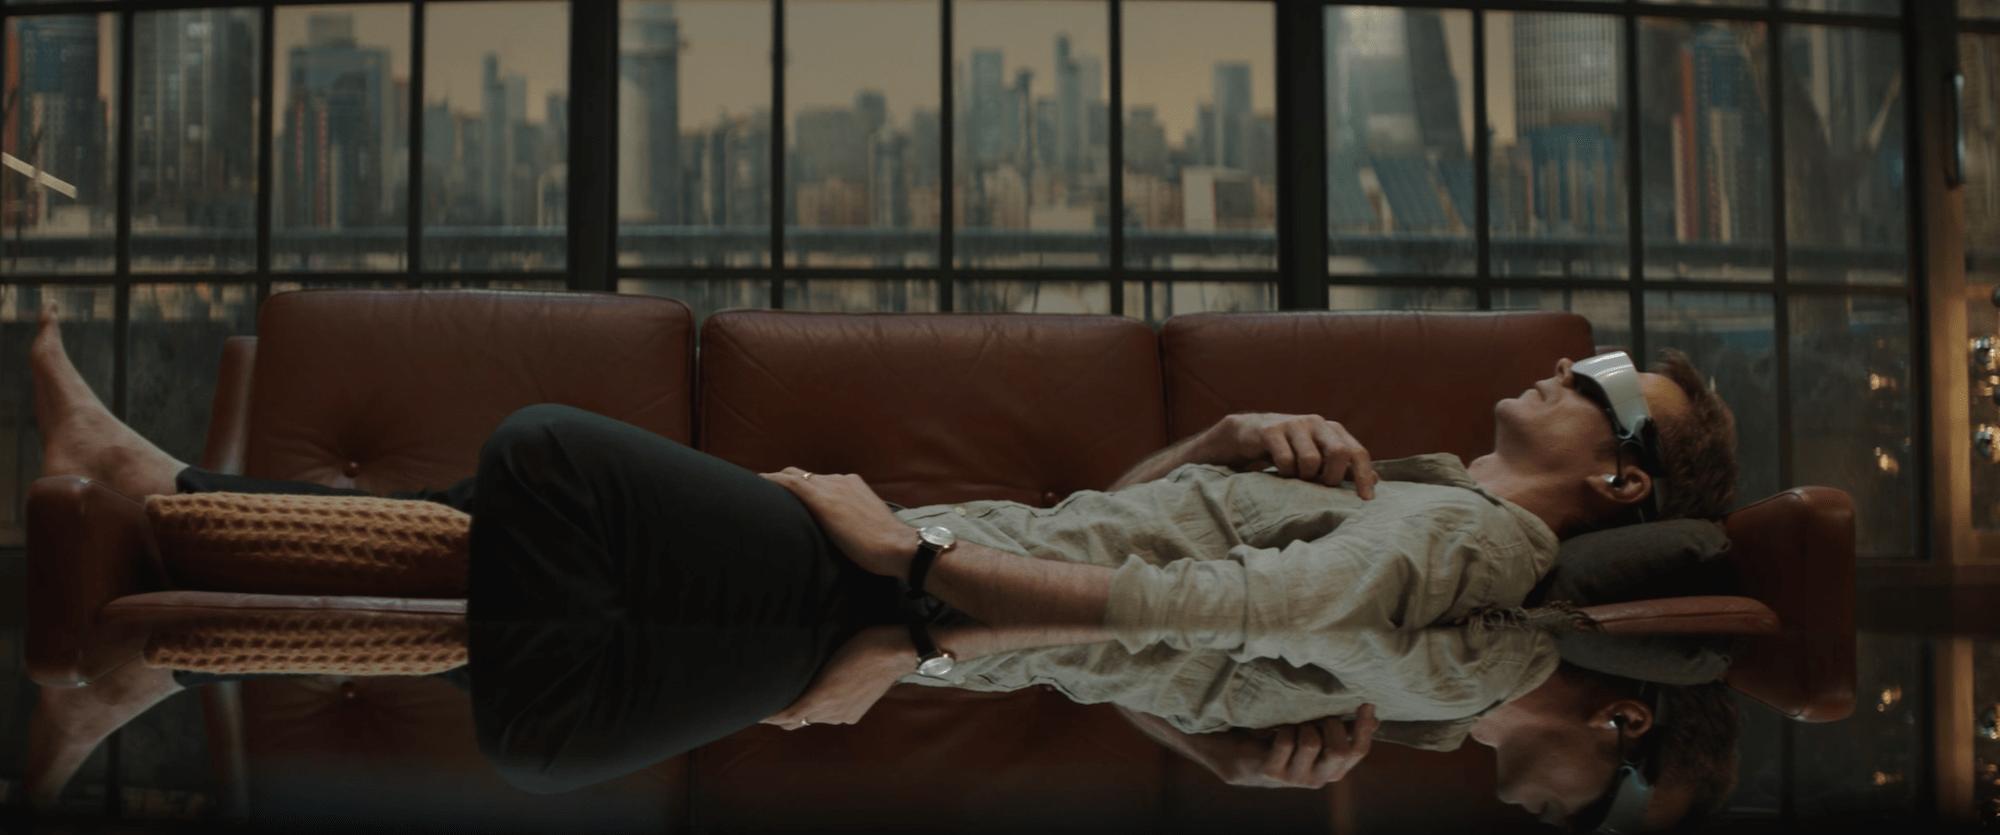 Dystopian Sci-Fi LX 2048 Arriving on Blu-ray/DVD & Digital from Dazzler Media (UK / 25th January)